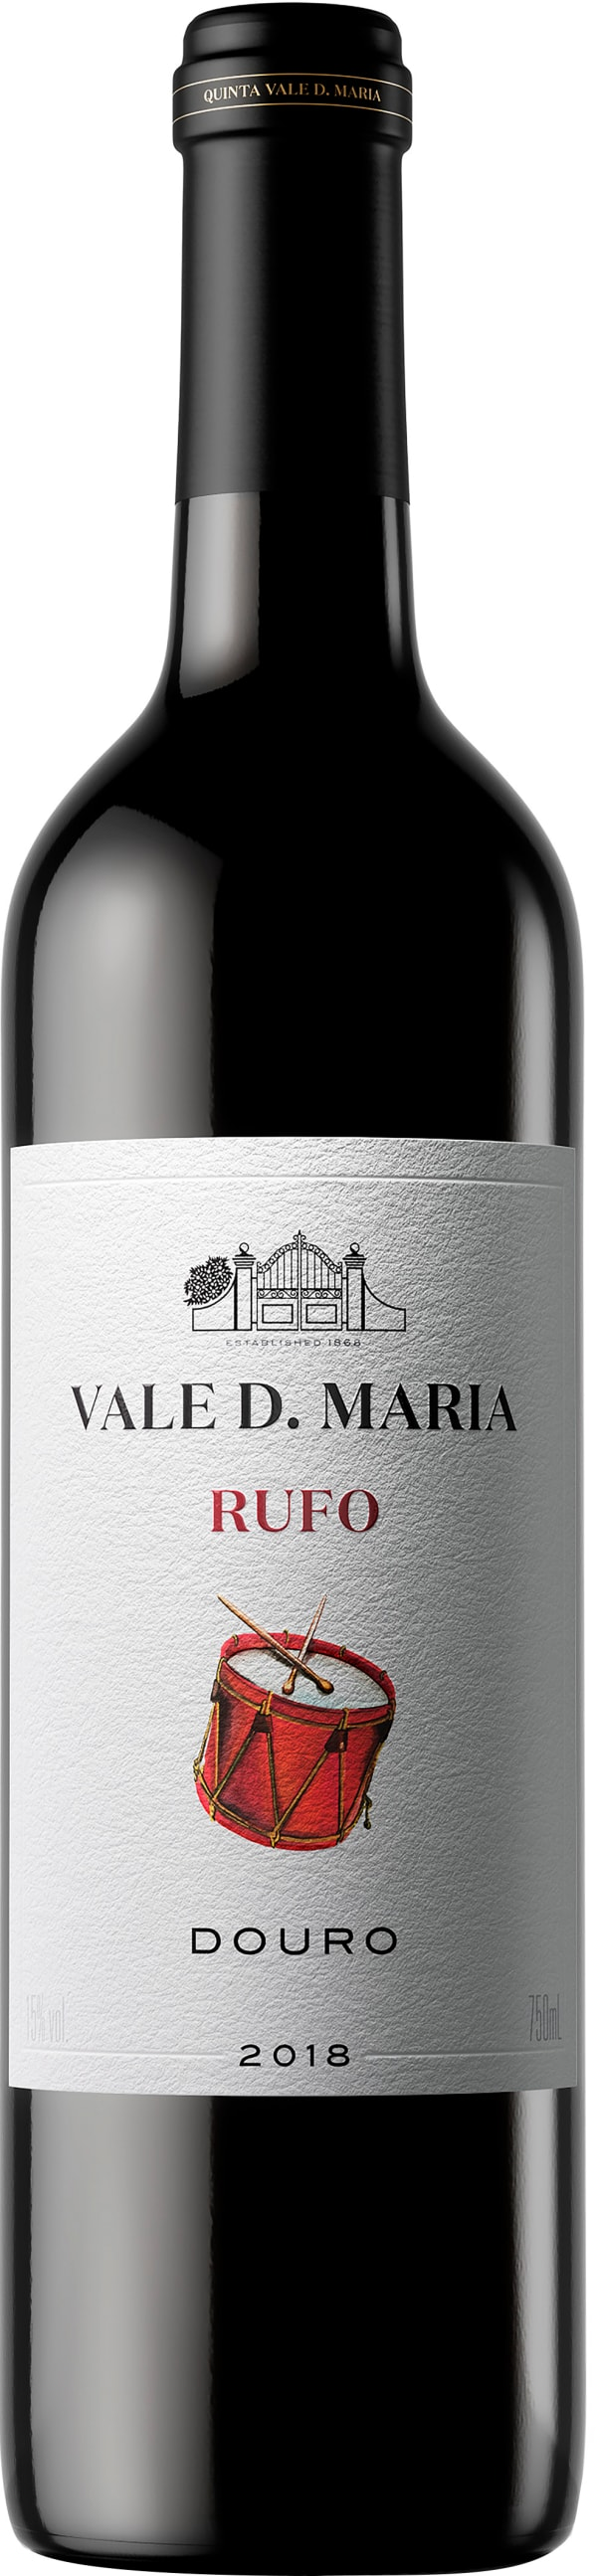 Vale D. Maria Rufo 2017